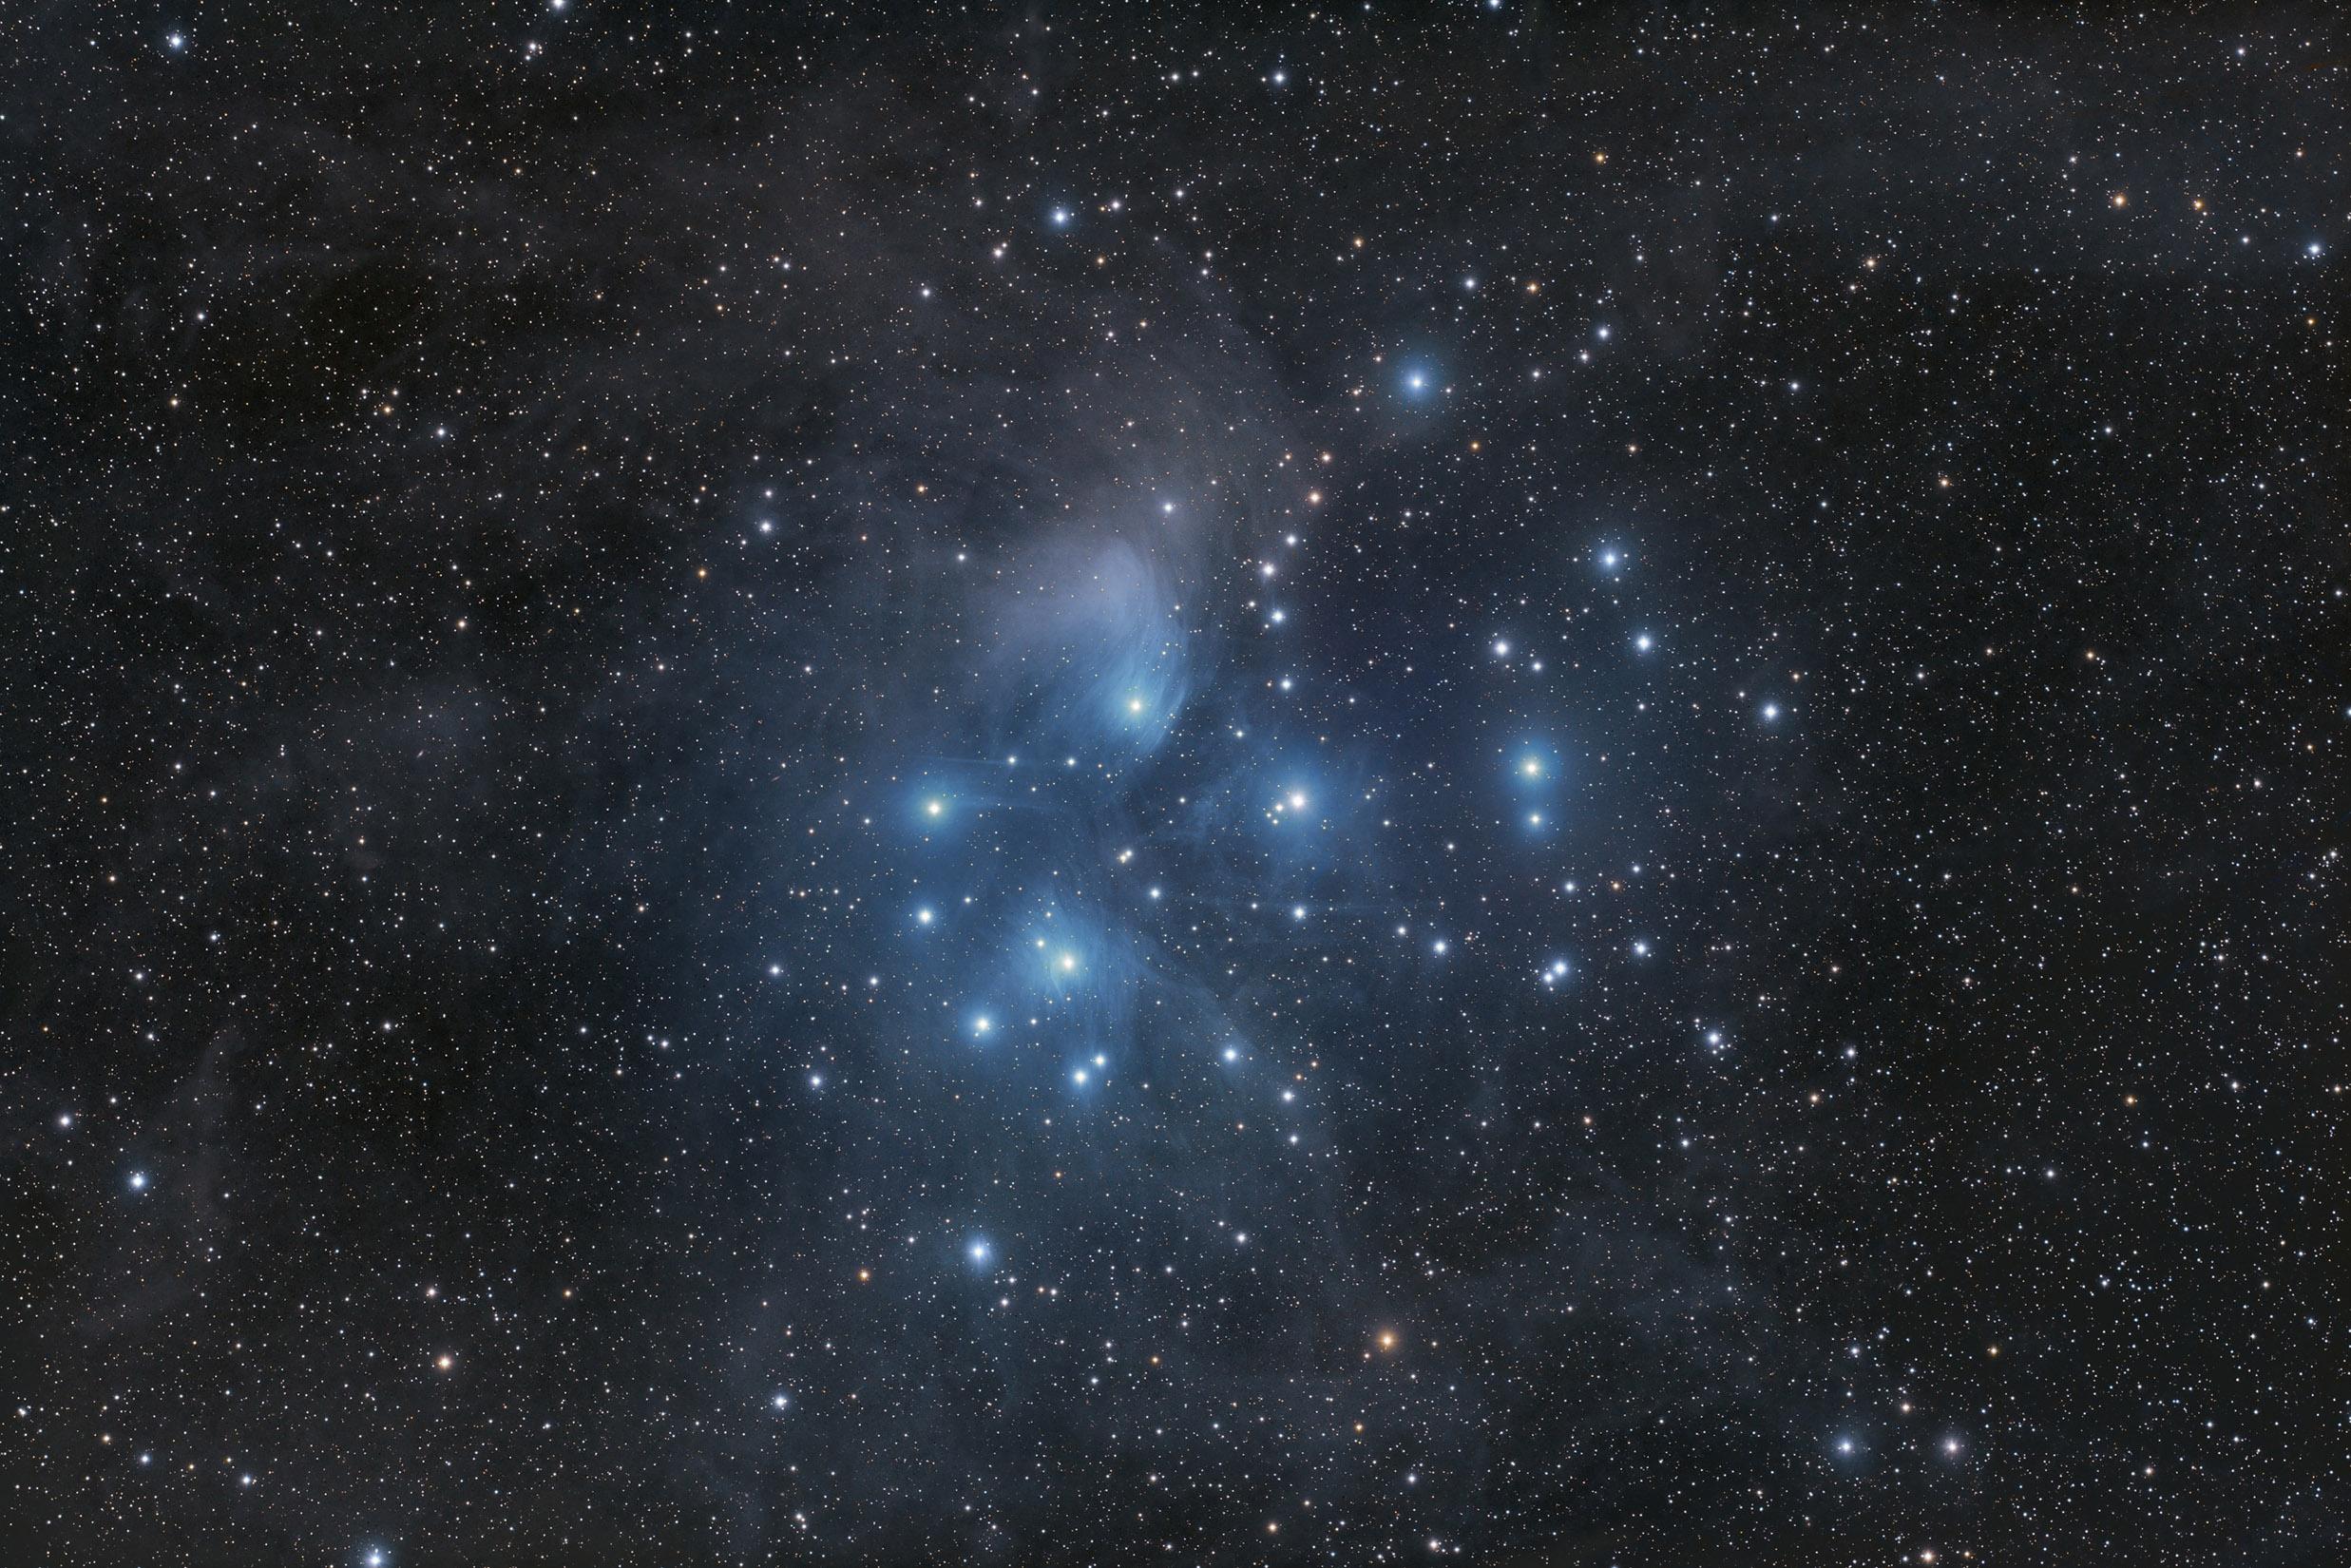 M45_2020_2500.jpg